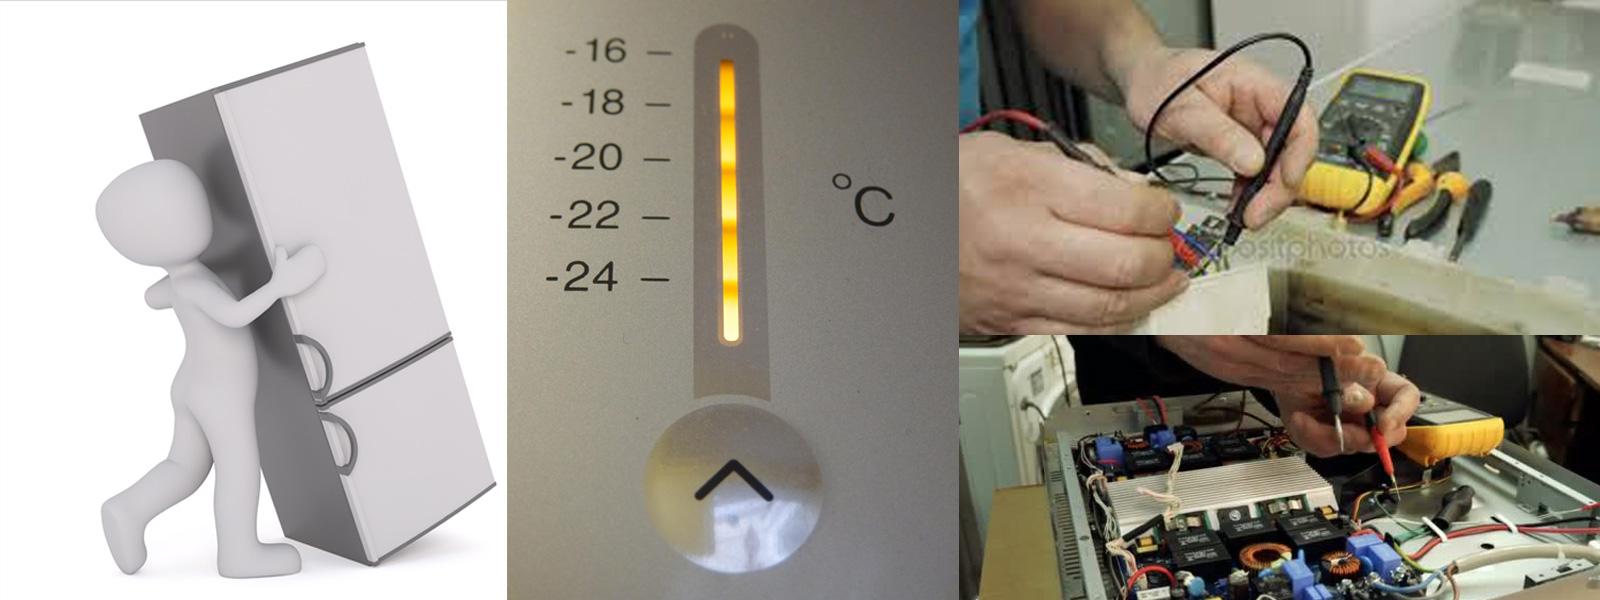 Kühlschrank Reparatur